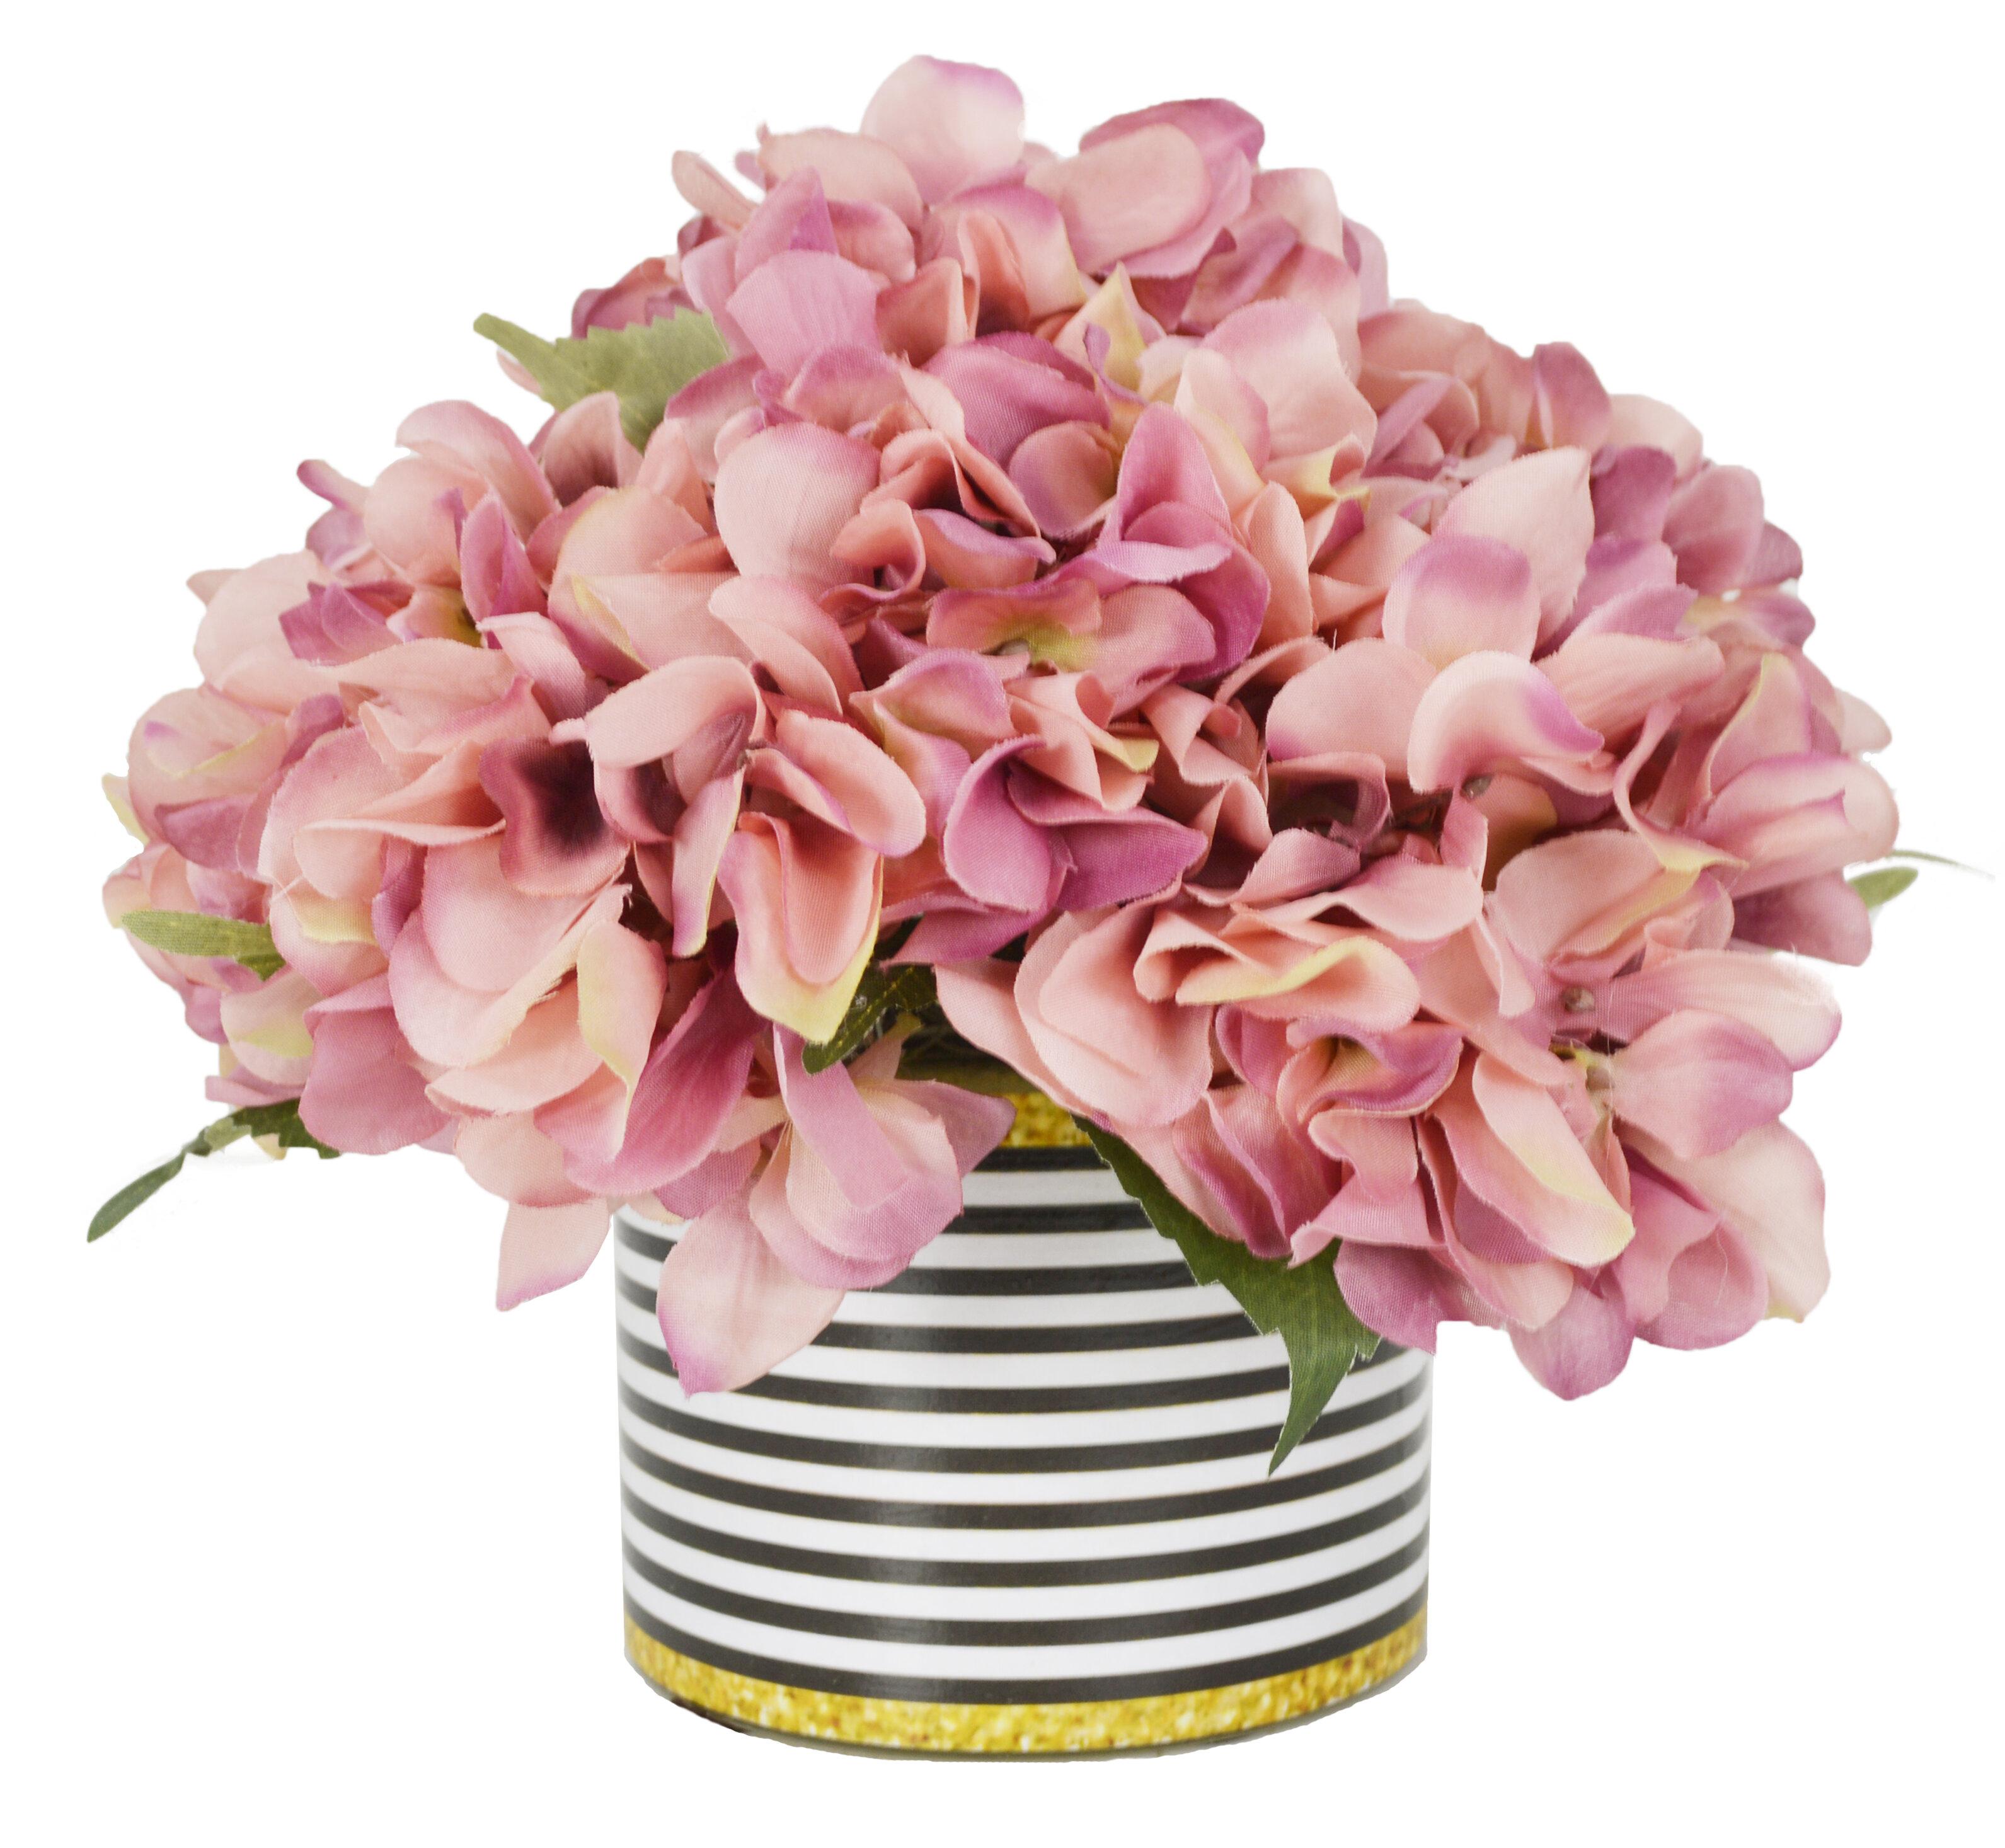 Willa Arlo Interiors Hydrangea Bouquet Floral Arrangement in Striped ...